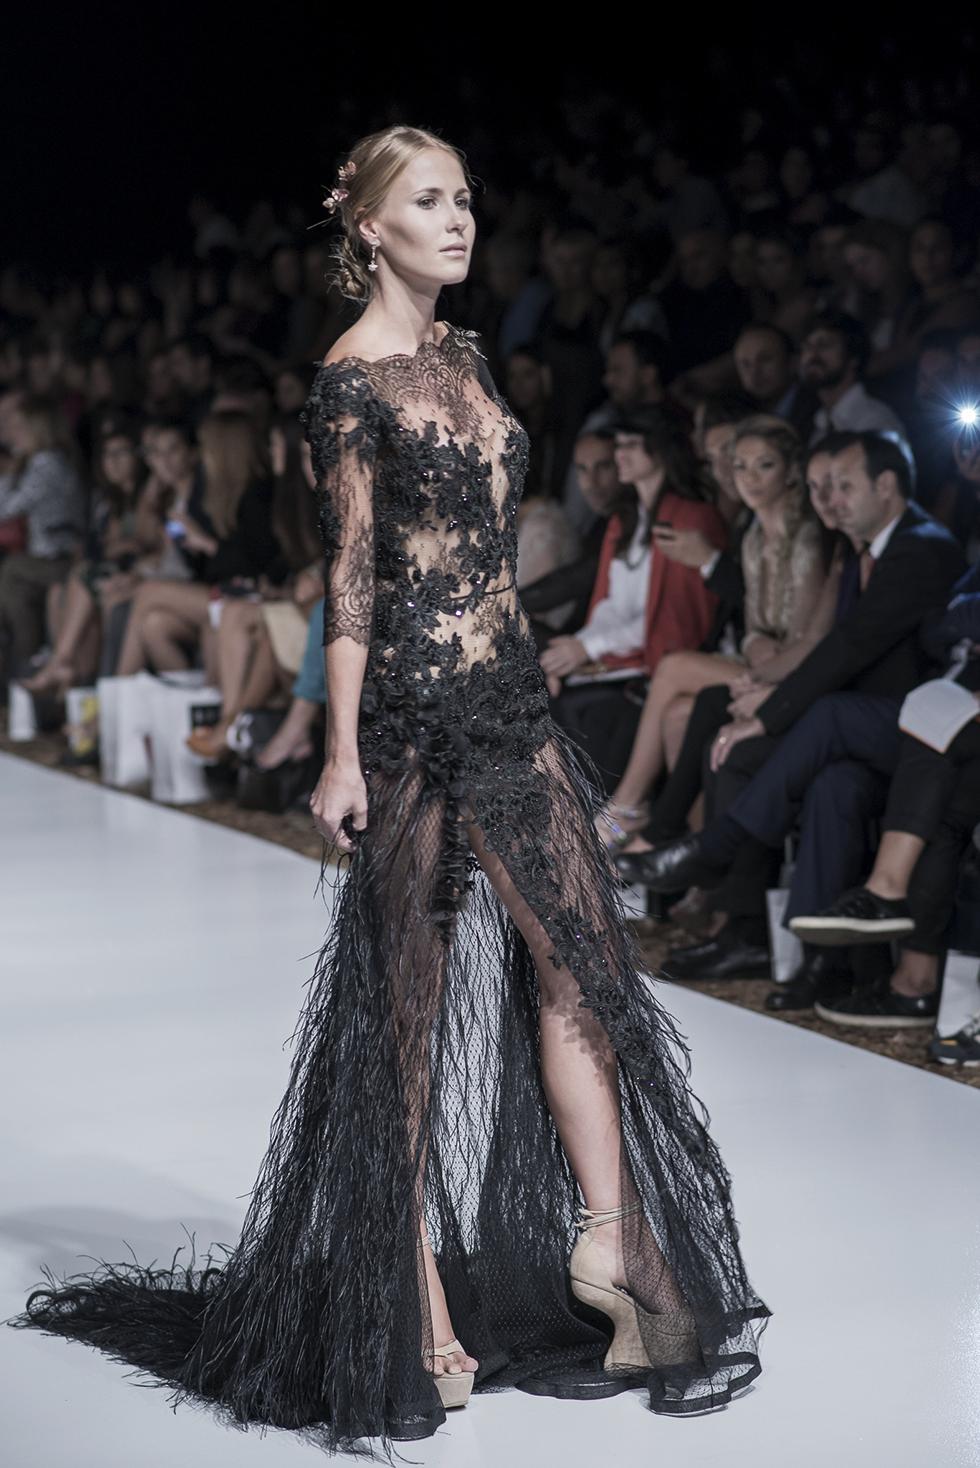 Fashionrella Bellissima Lifweekpv16  4